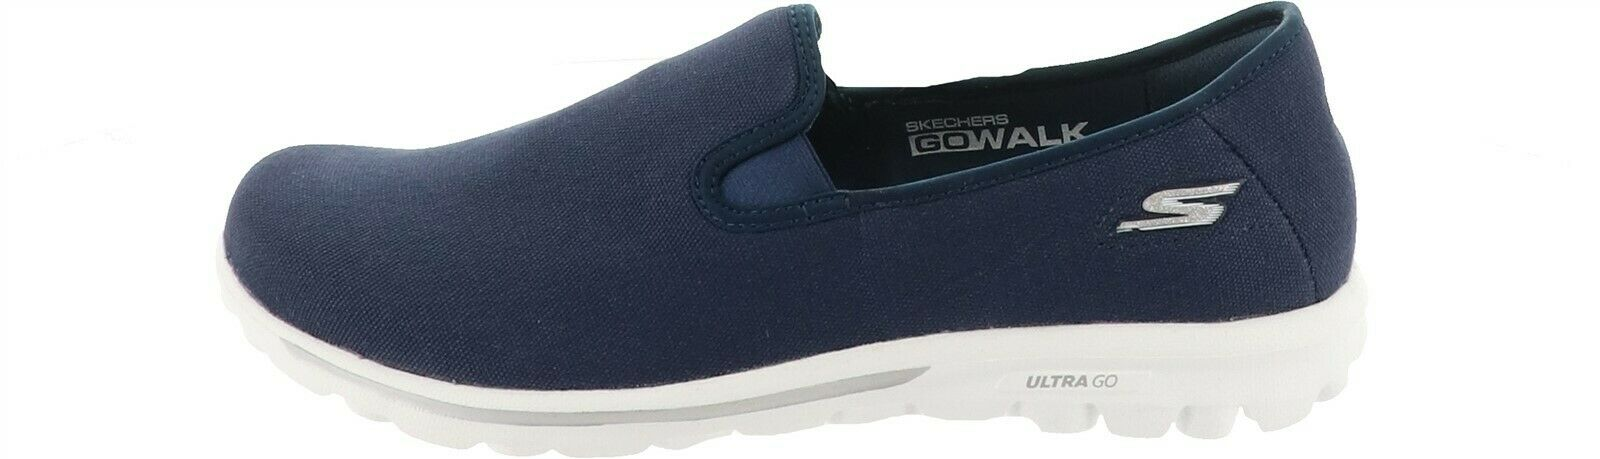 Skechers GOwalk Canvas Slip-On Shoes